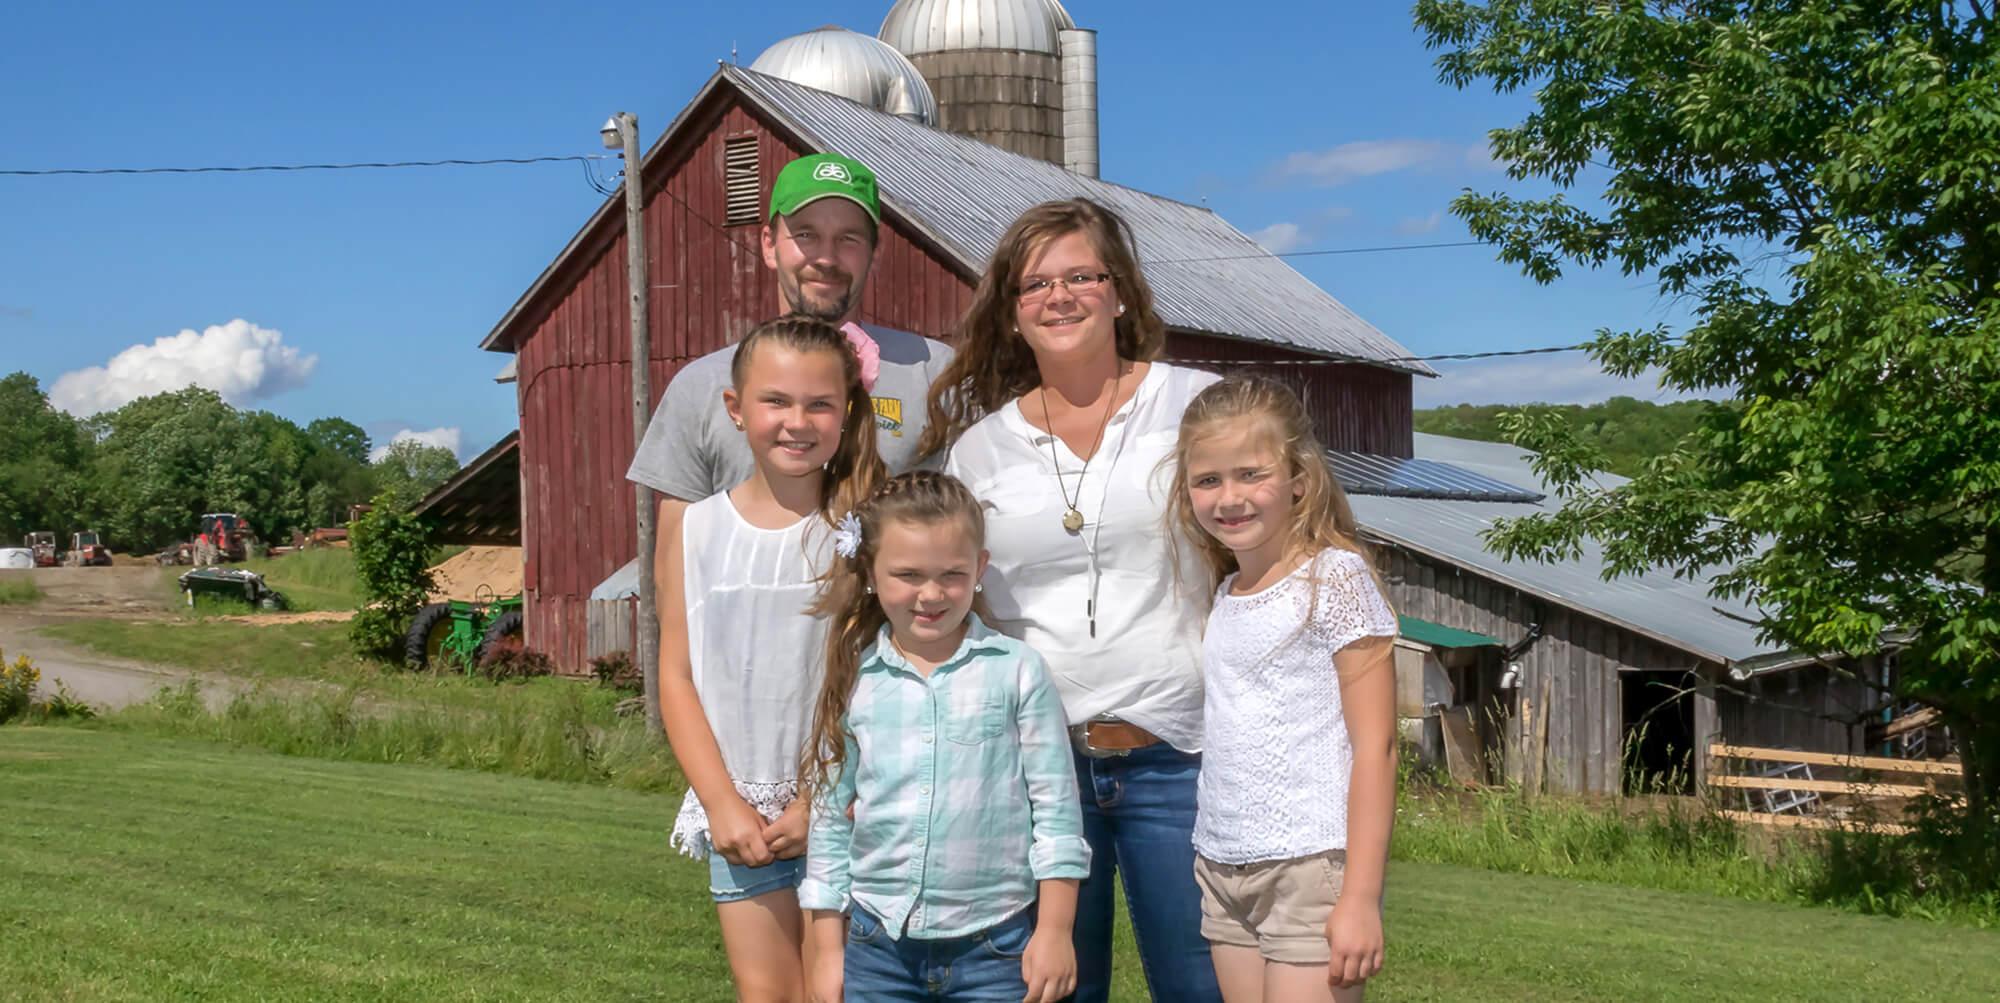 Waltz Farm family image - Waltz Farm